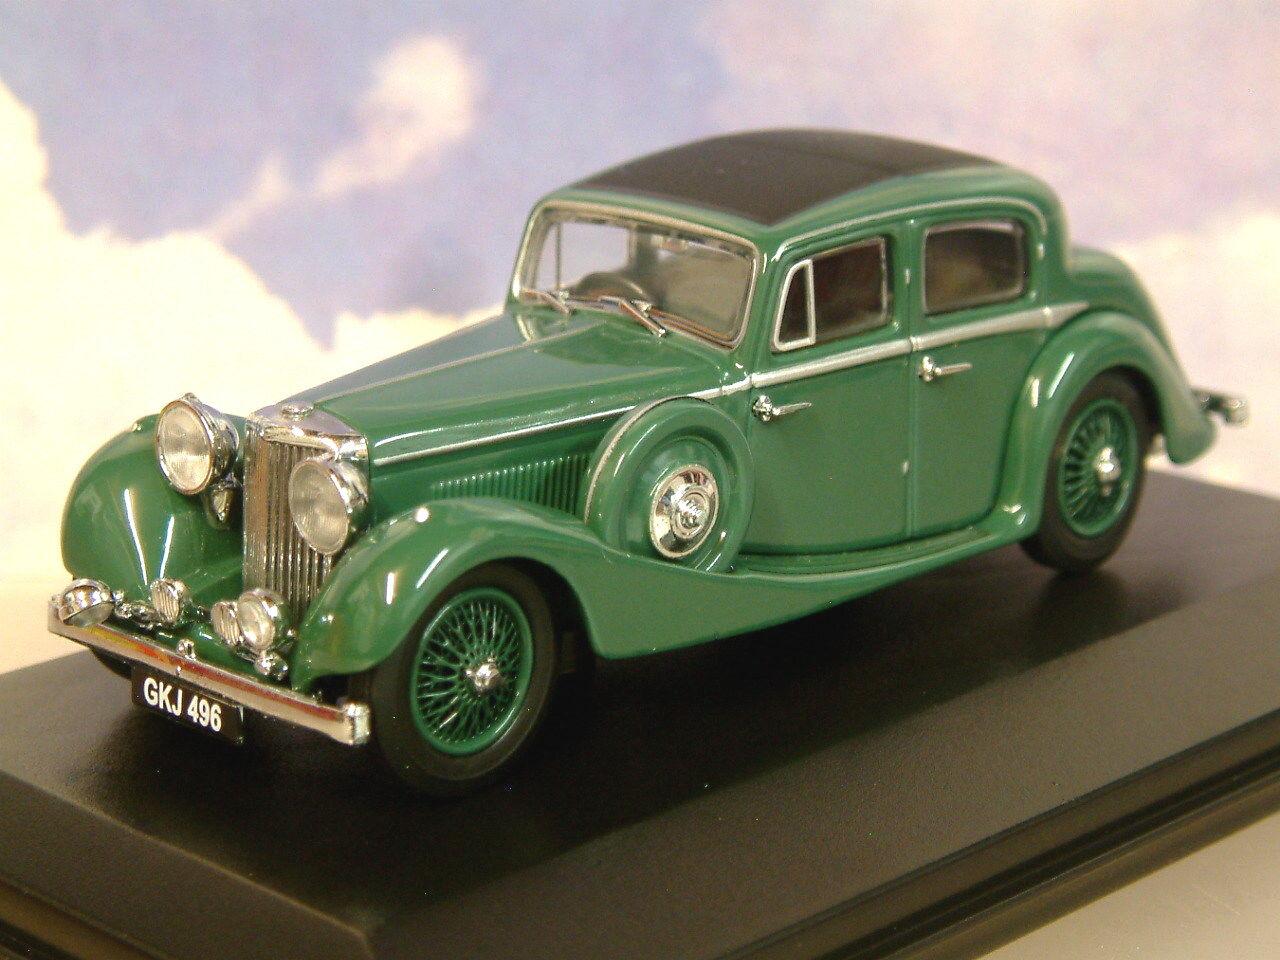 Superbe Oxford Diecast 1 43 Ss Jaguar 2.5 Litre Berline en Daim Vert Jss005